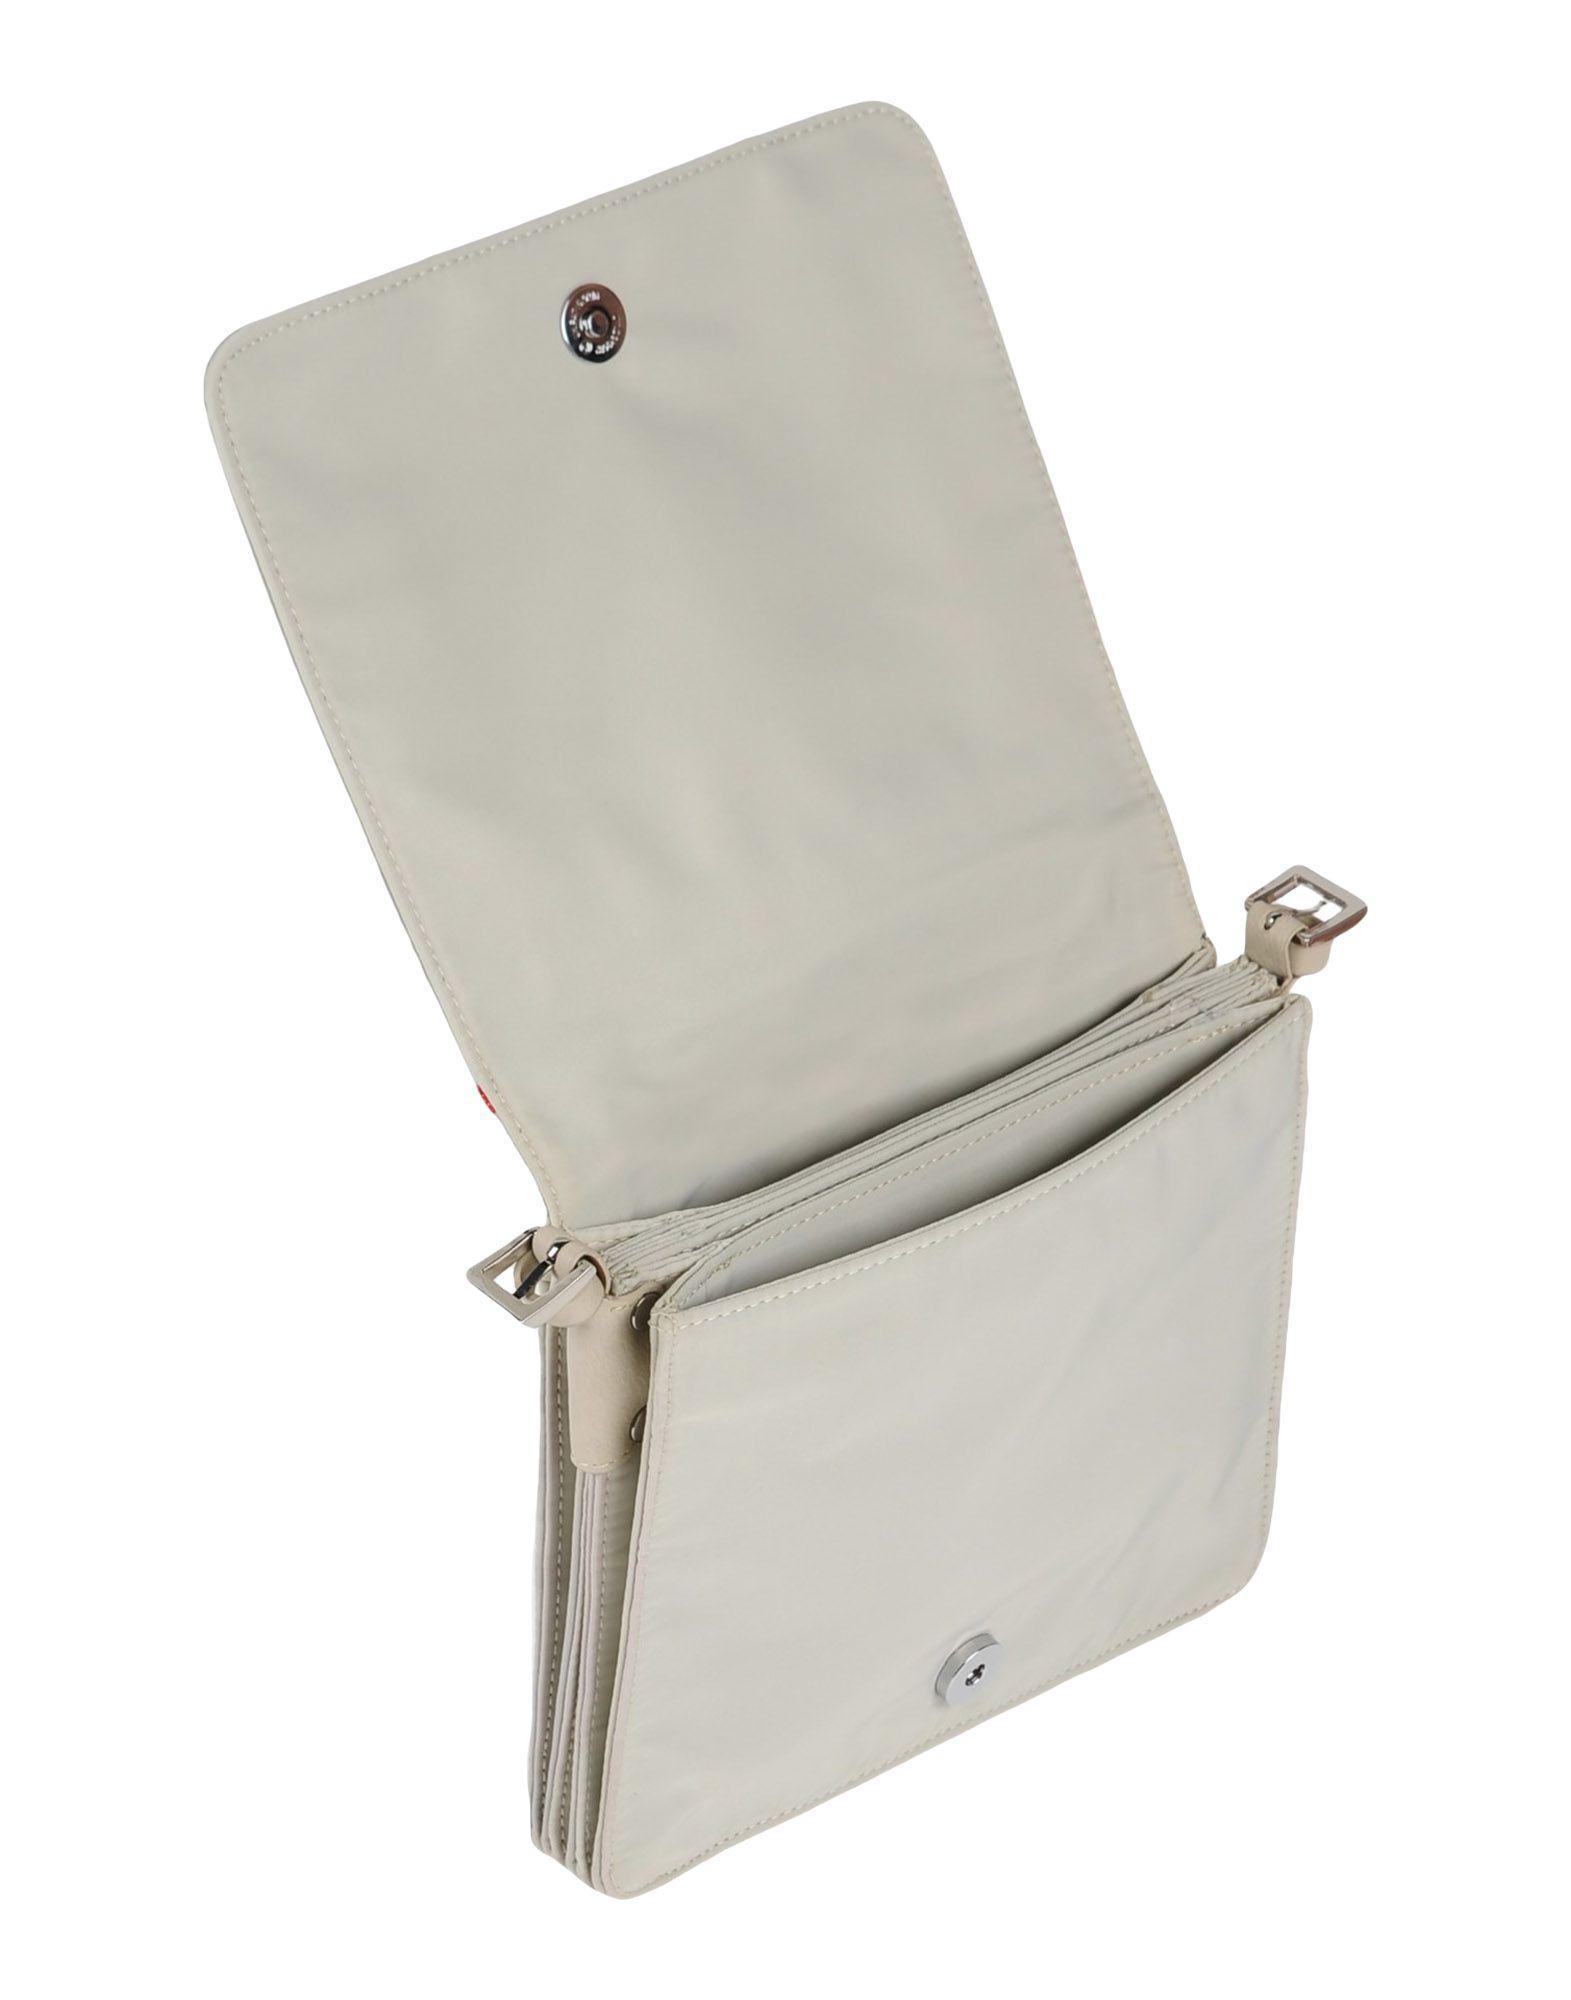 Tosca Blu Synthetic Cross-body Bag in Light Grey (Grey)